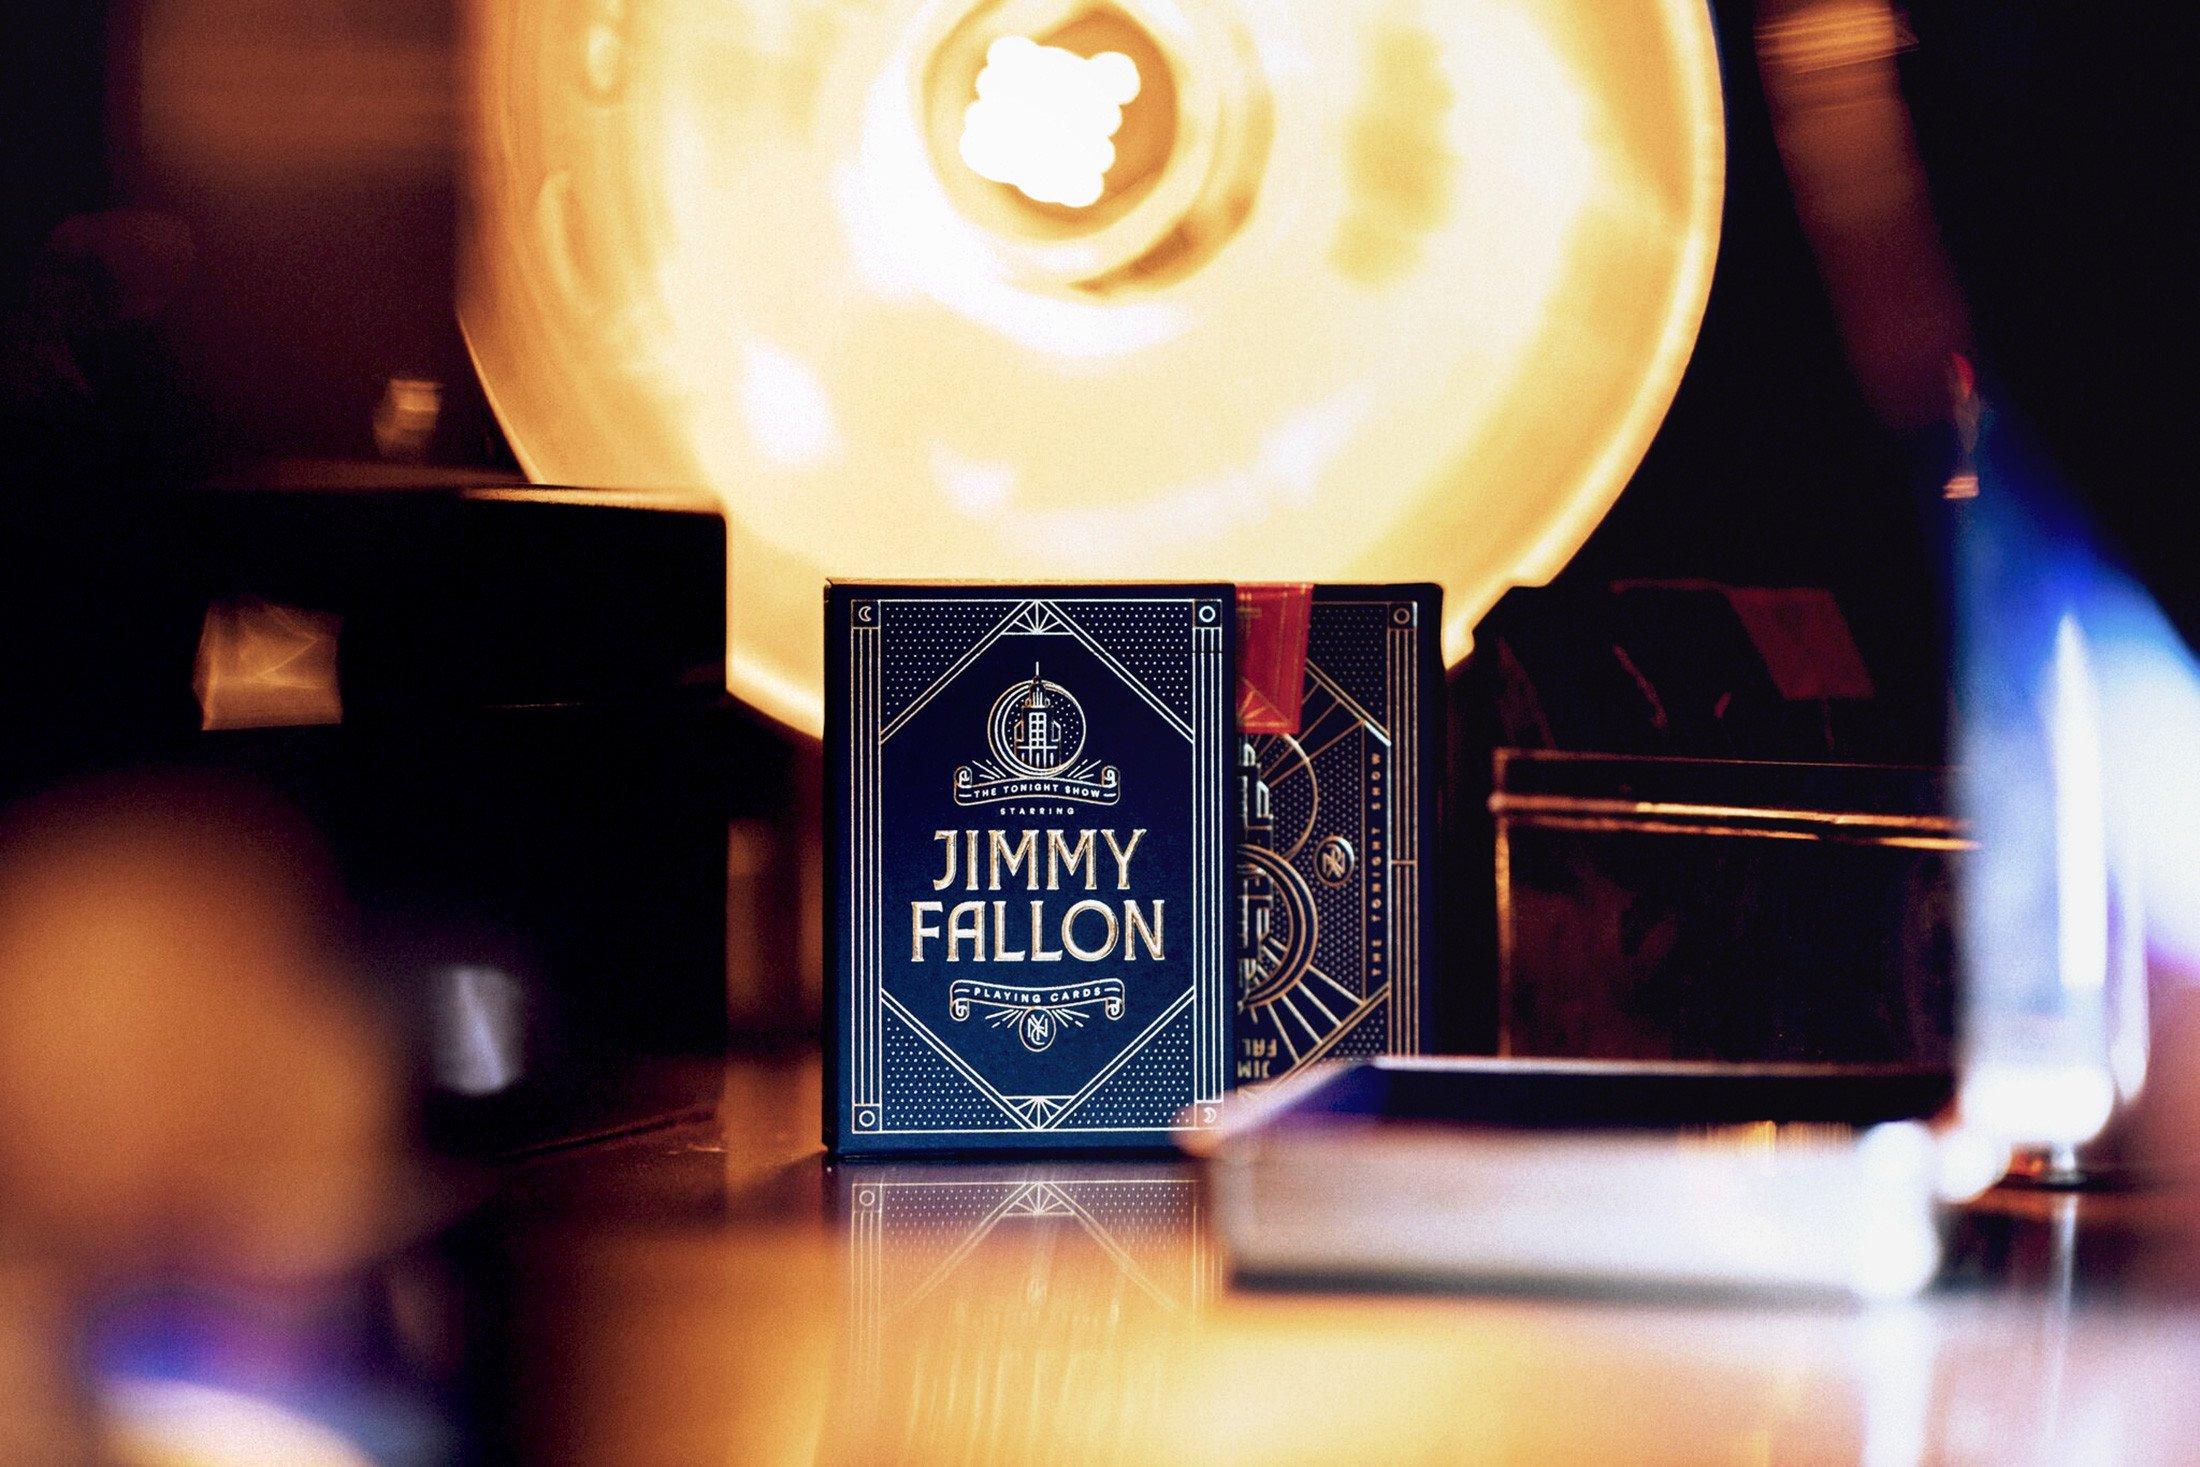 jimmy-fallon-playing-cards-11.jpg